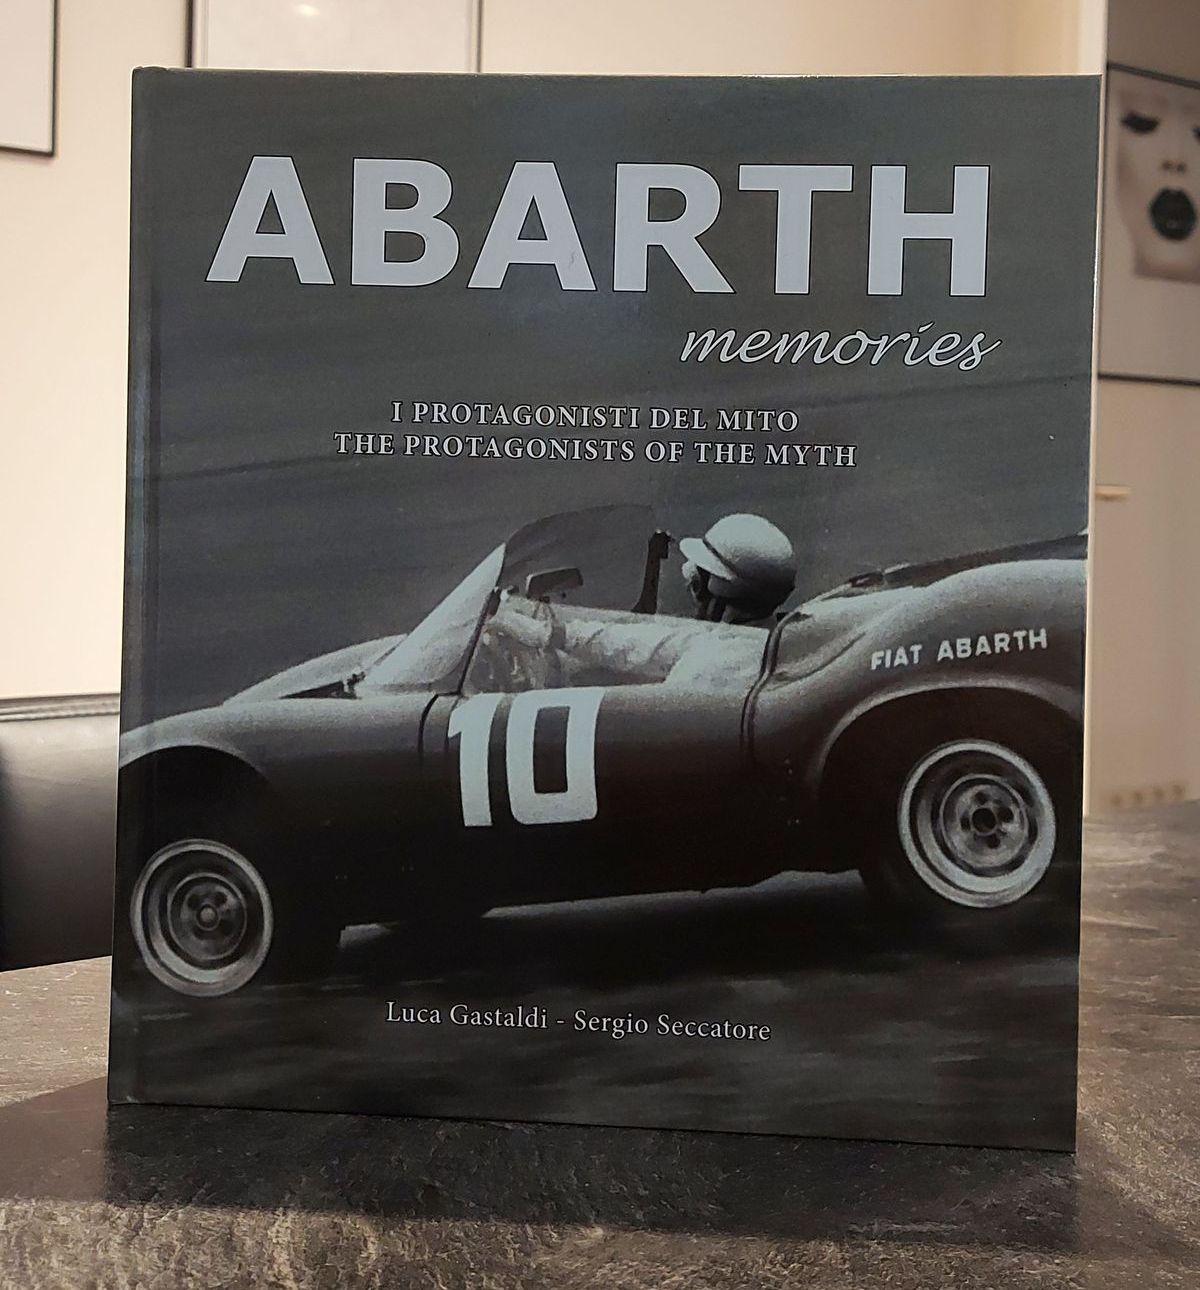 Abarth Memories Luca Gastaldi (Autor), Sergio Seccatore (Autor), Gabriele Guidetti (Illustrator), Actualfoto (Fotograf) 39,90 Euro, mehrsprachig, ISBN: 9791220001328